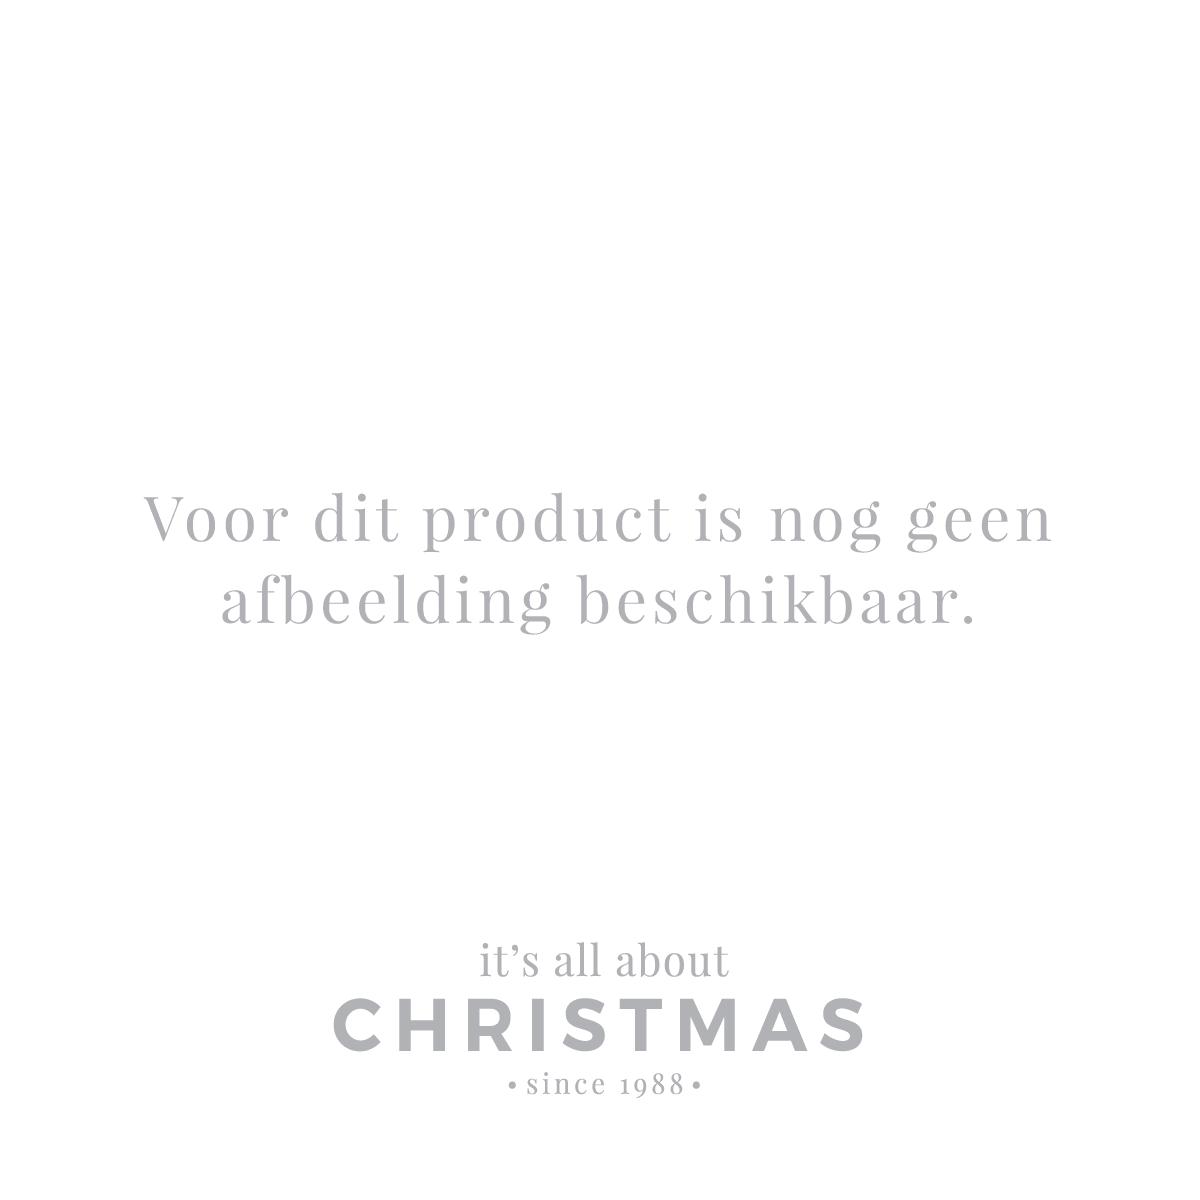 Glitzer 3D-Blume créme-weiß, 9 cm